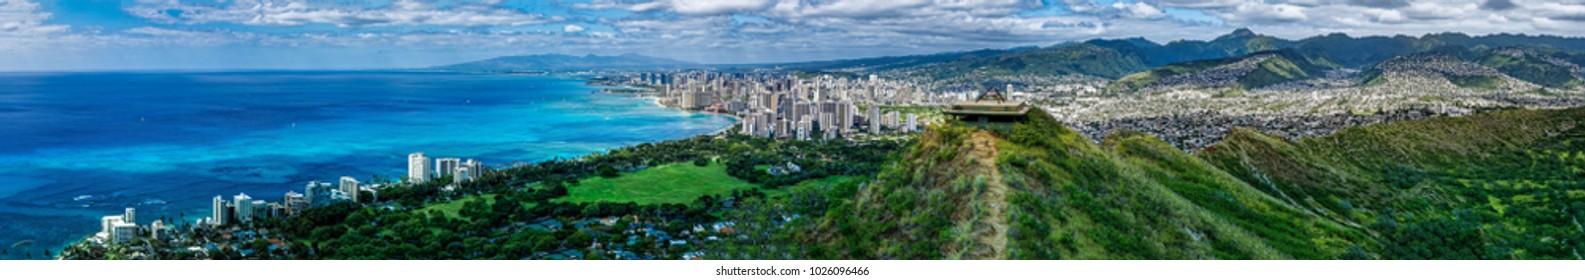 Panoramic view of Waikiki from Diamond Head in Oahu Hawaii